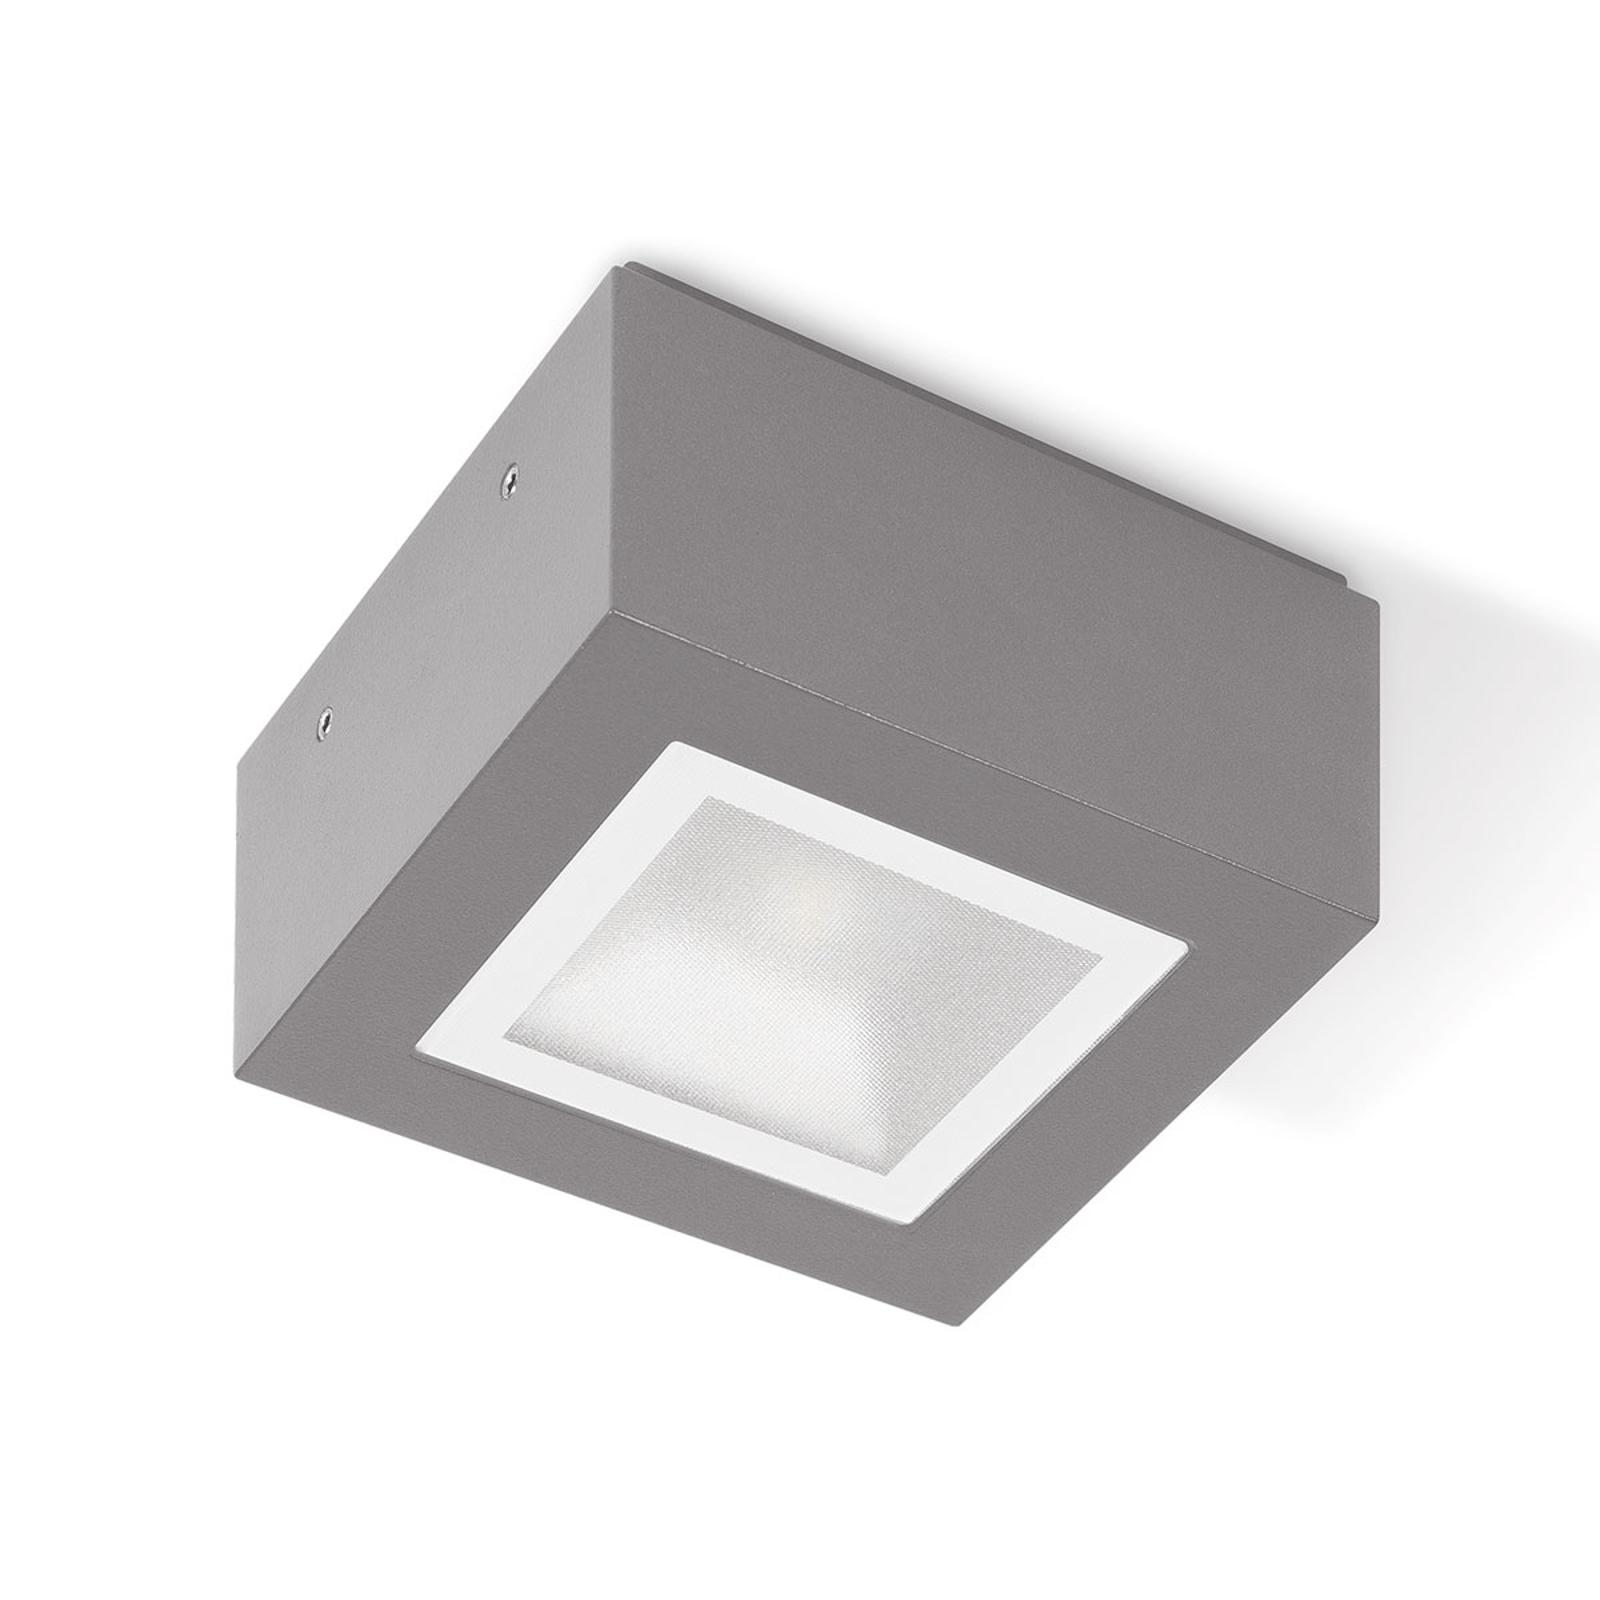 LED-taklampe Mimik 10 Tech Mikroprisma 3000K